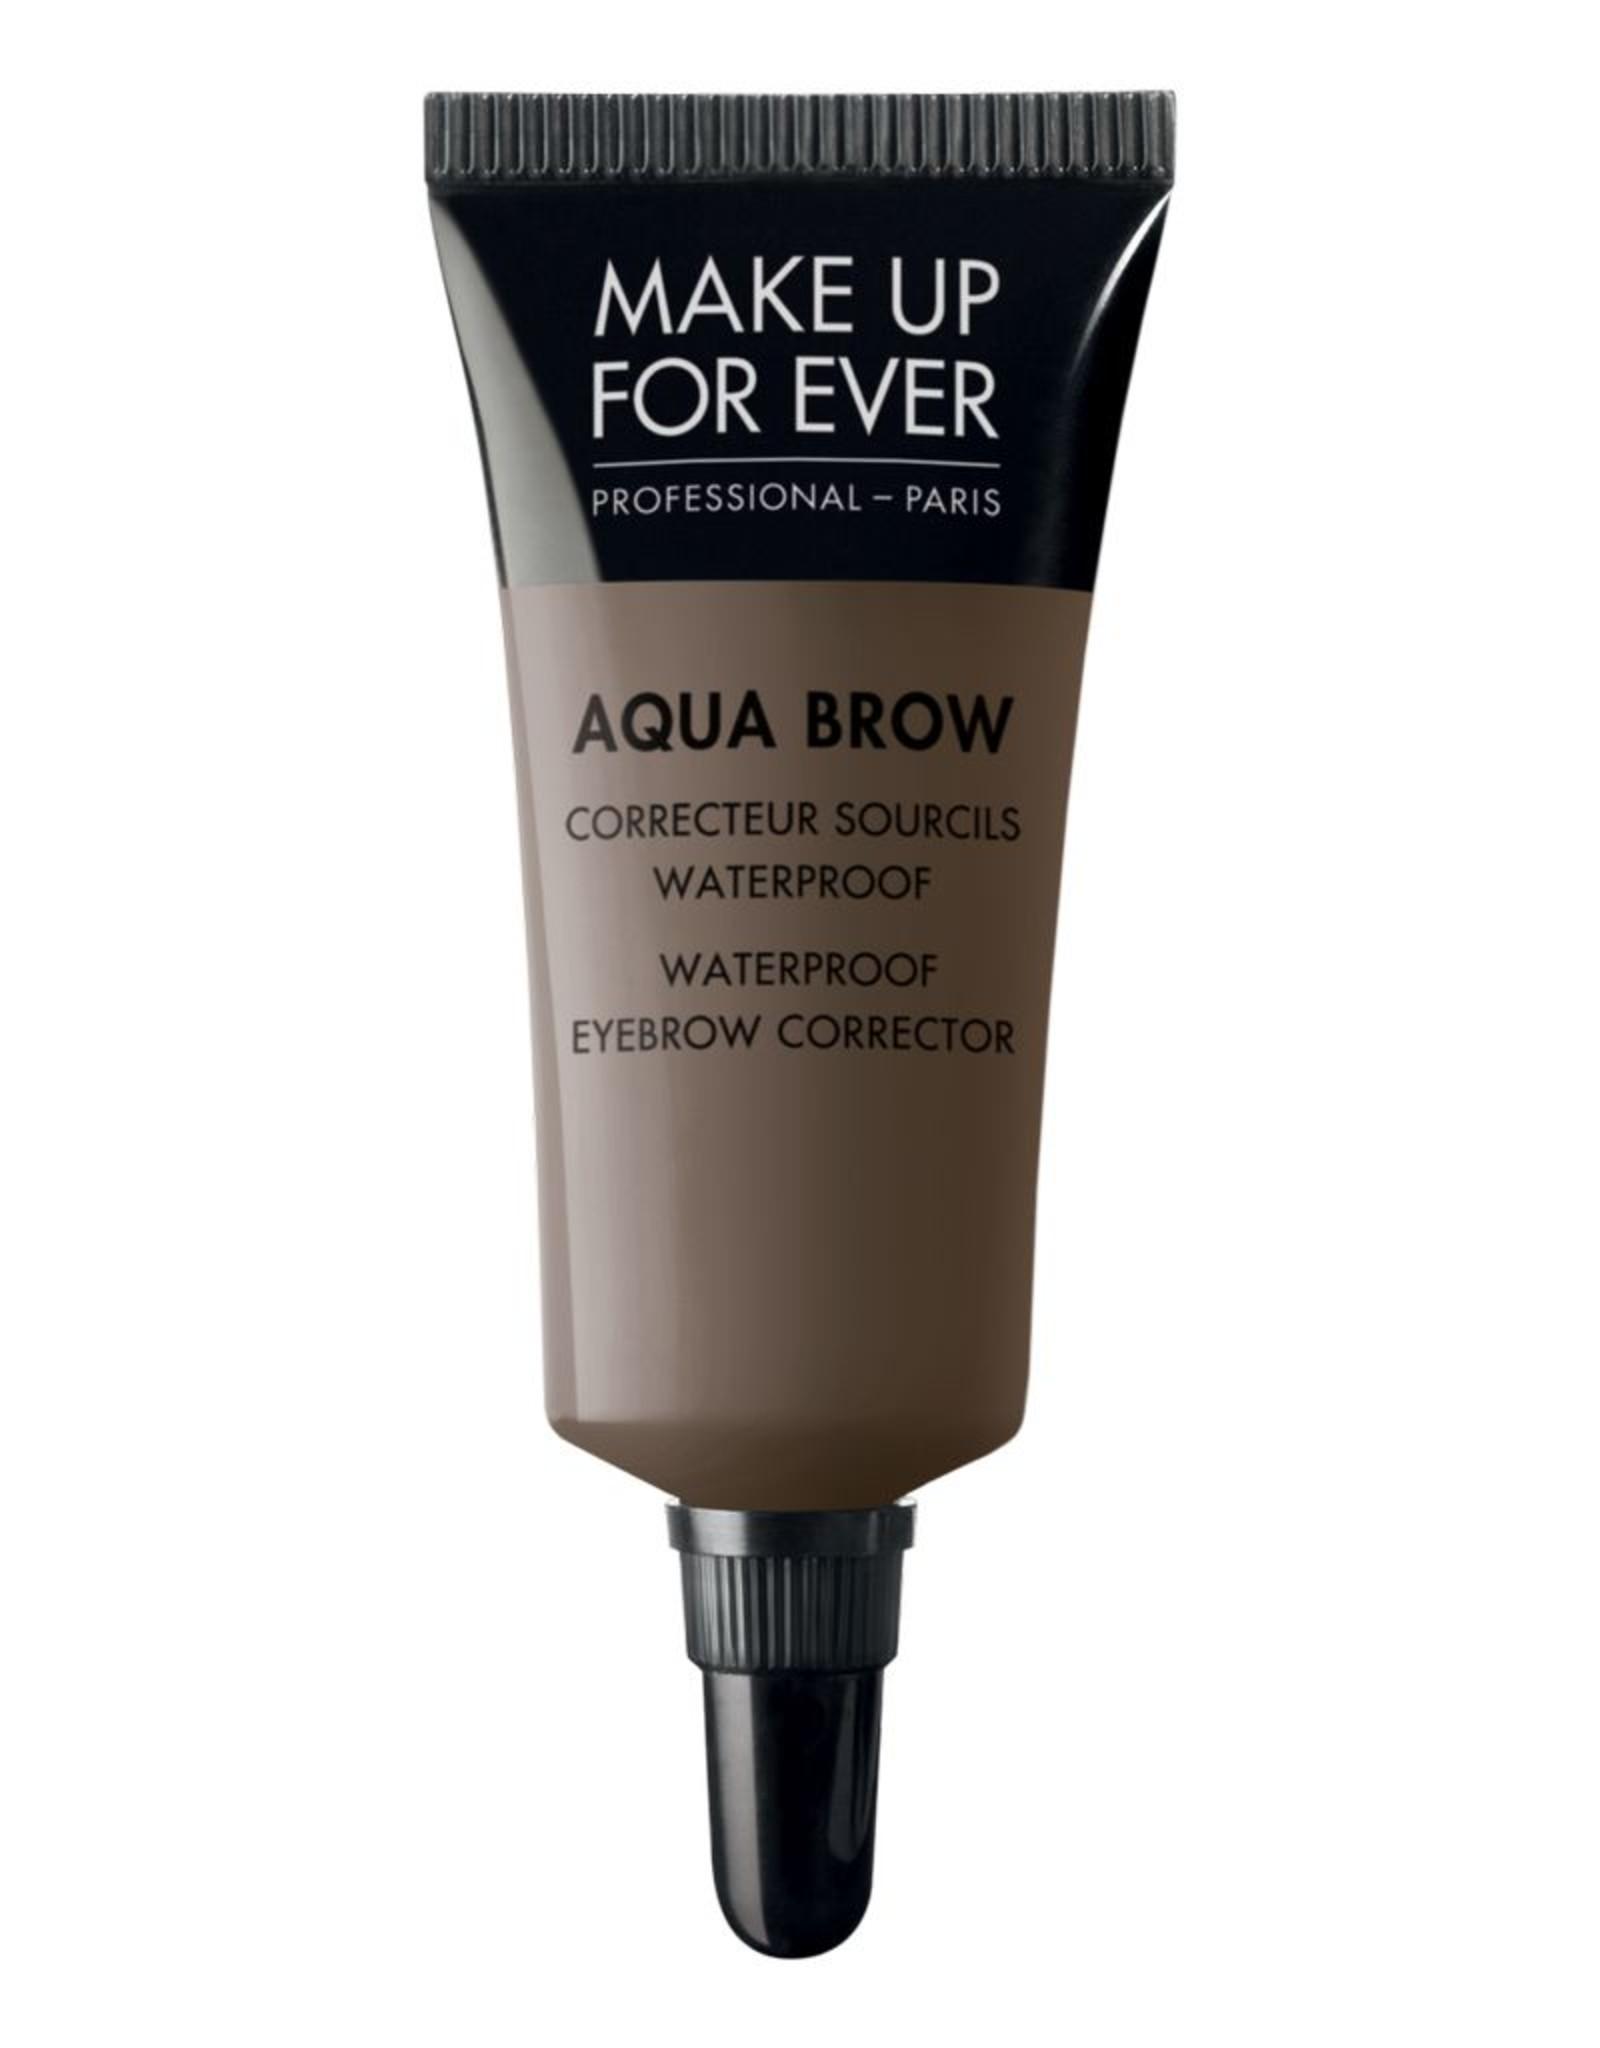 MUFE AQUA BROW 7ml (recharge uniquement)#25 Cendre / Ash